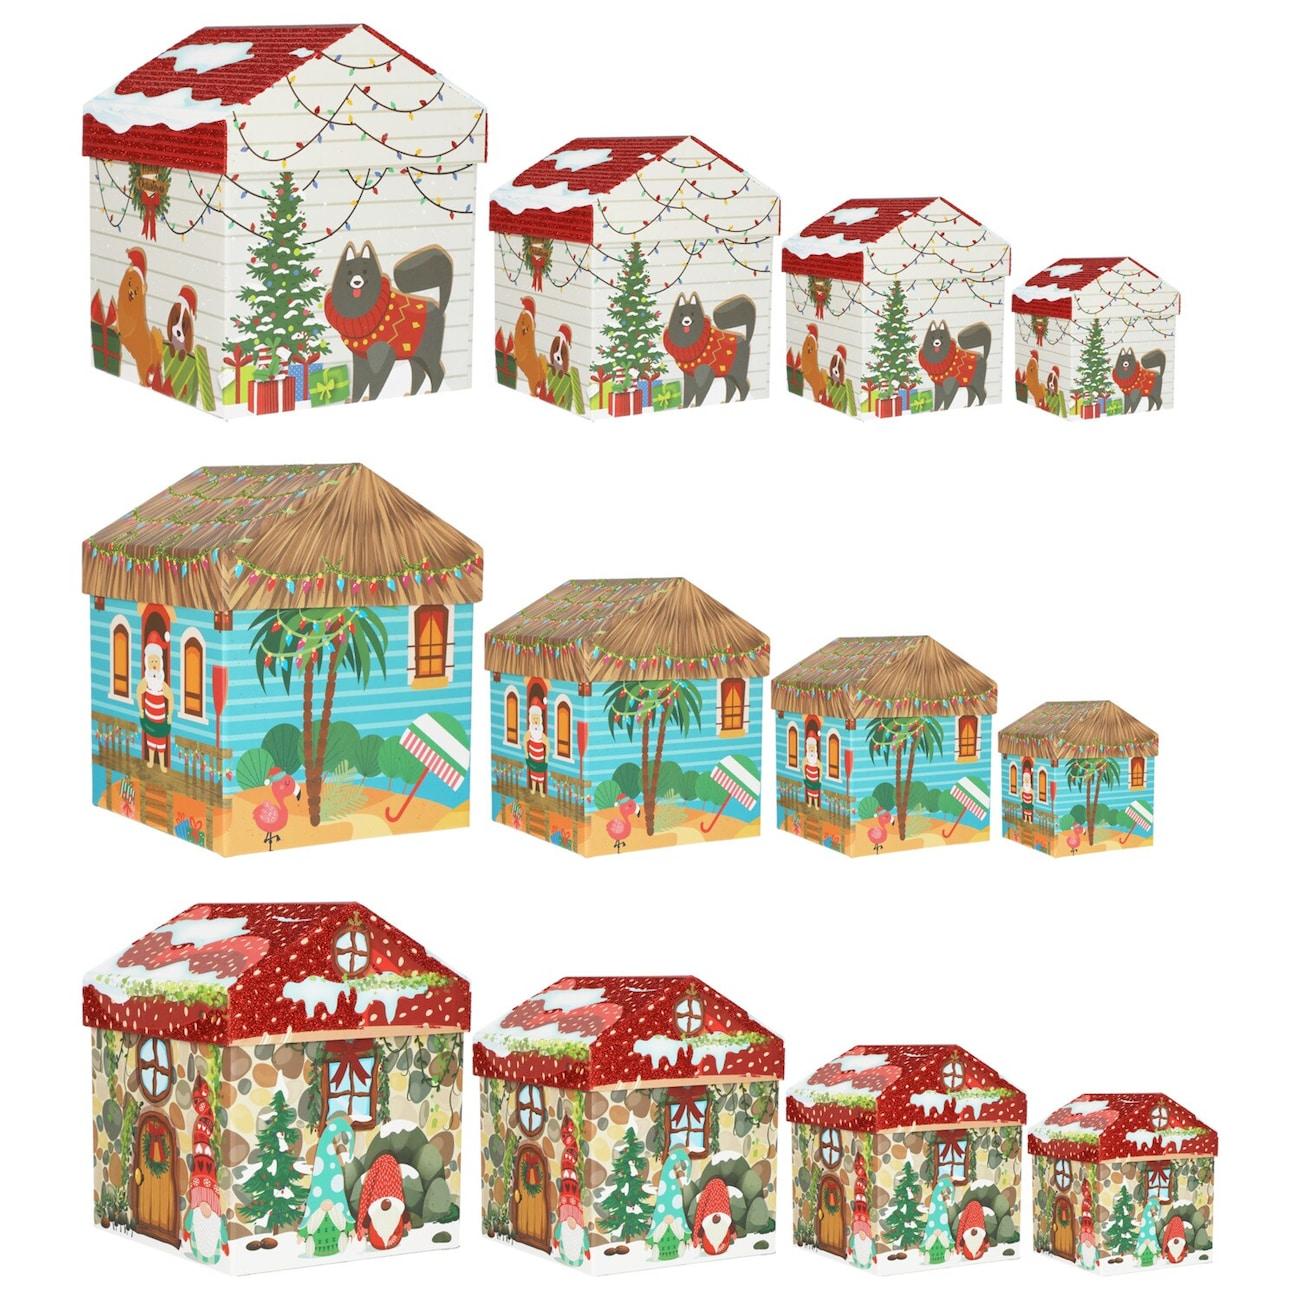 Nesting Christmas Gift Boxes - Dollar Tree, Inc.